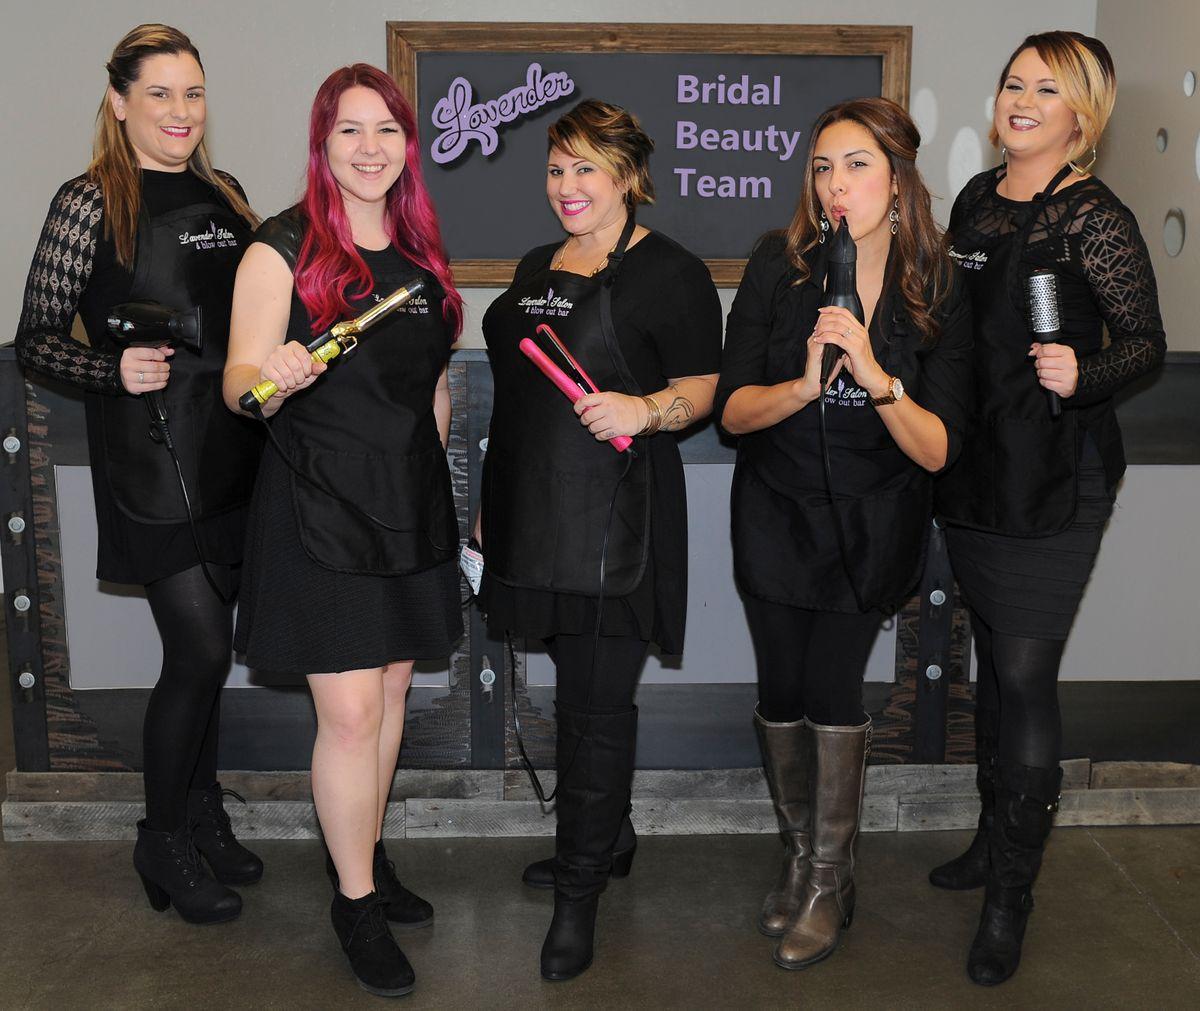 Bridal Beauty Team3.jpg